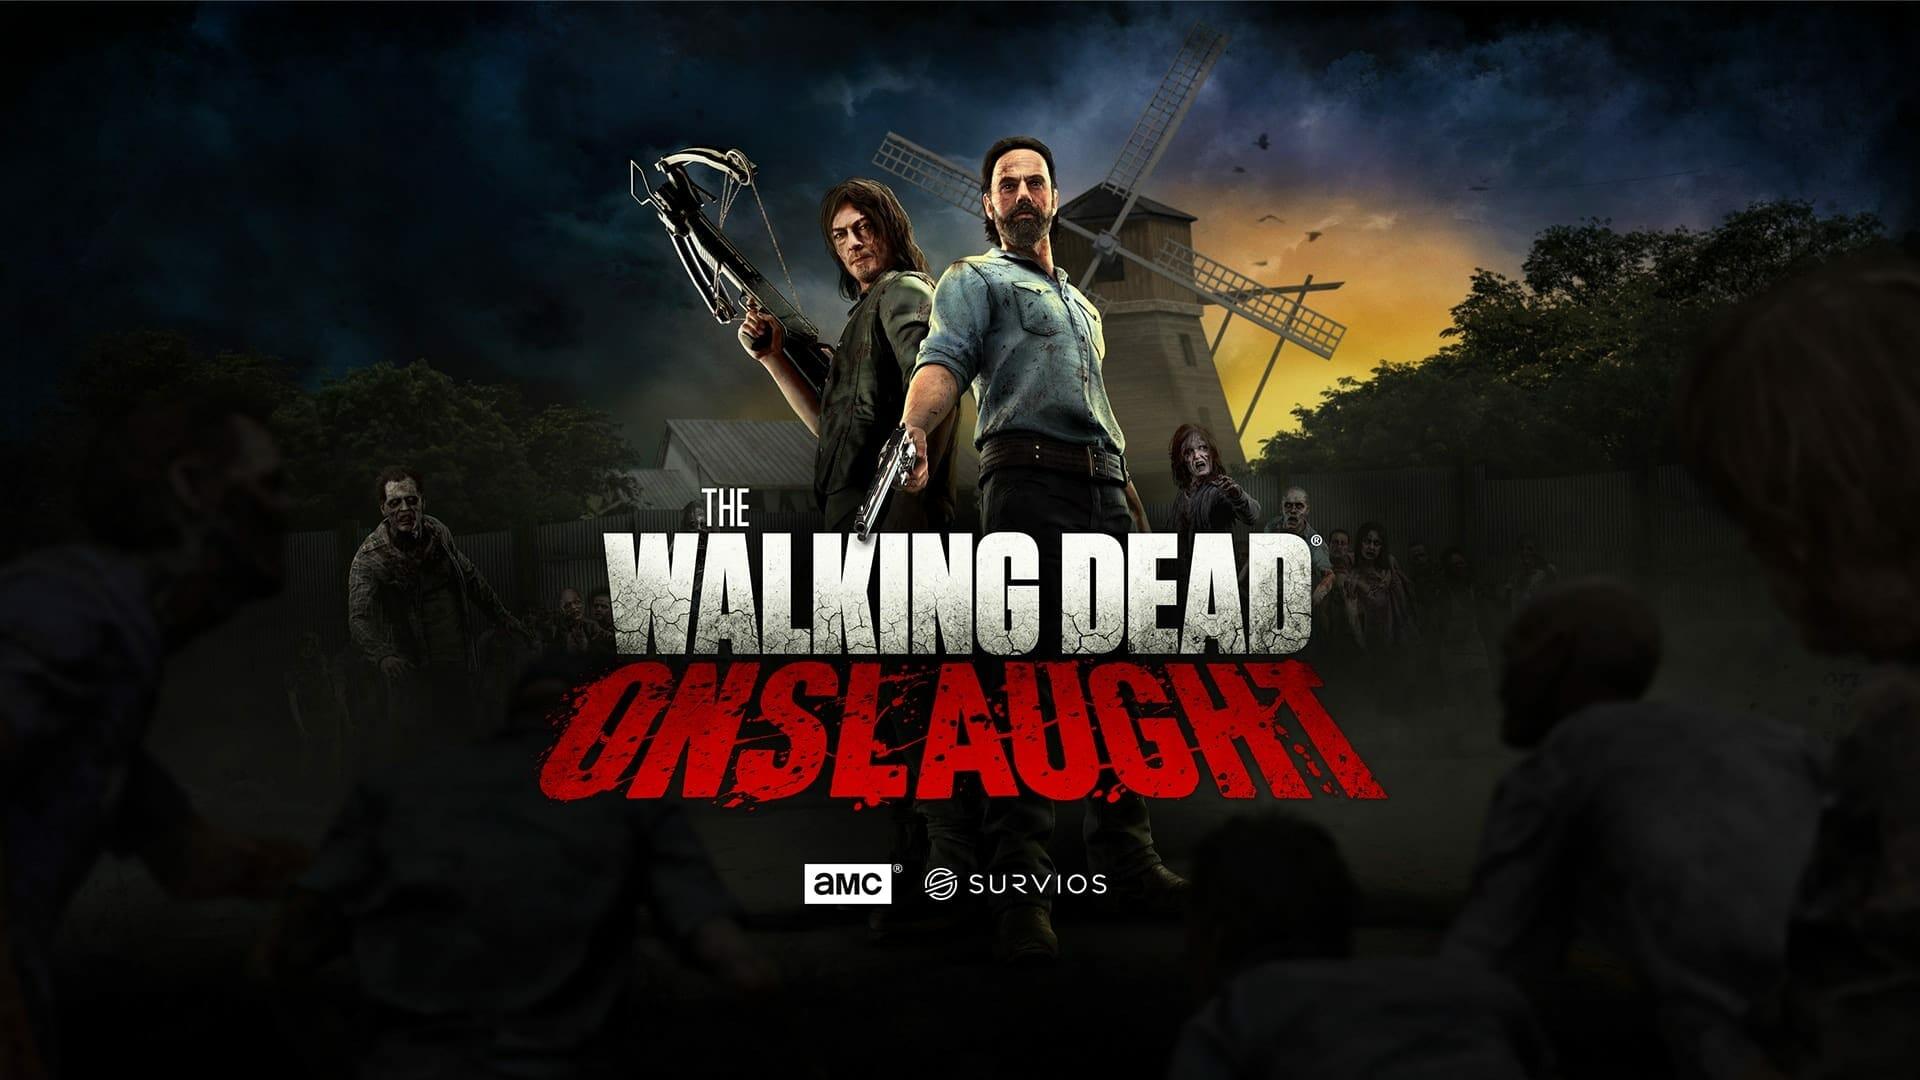 The Walking Dead Onslaught Pre-Order Bonus